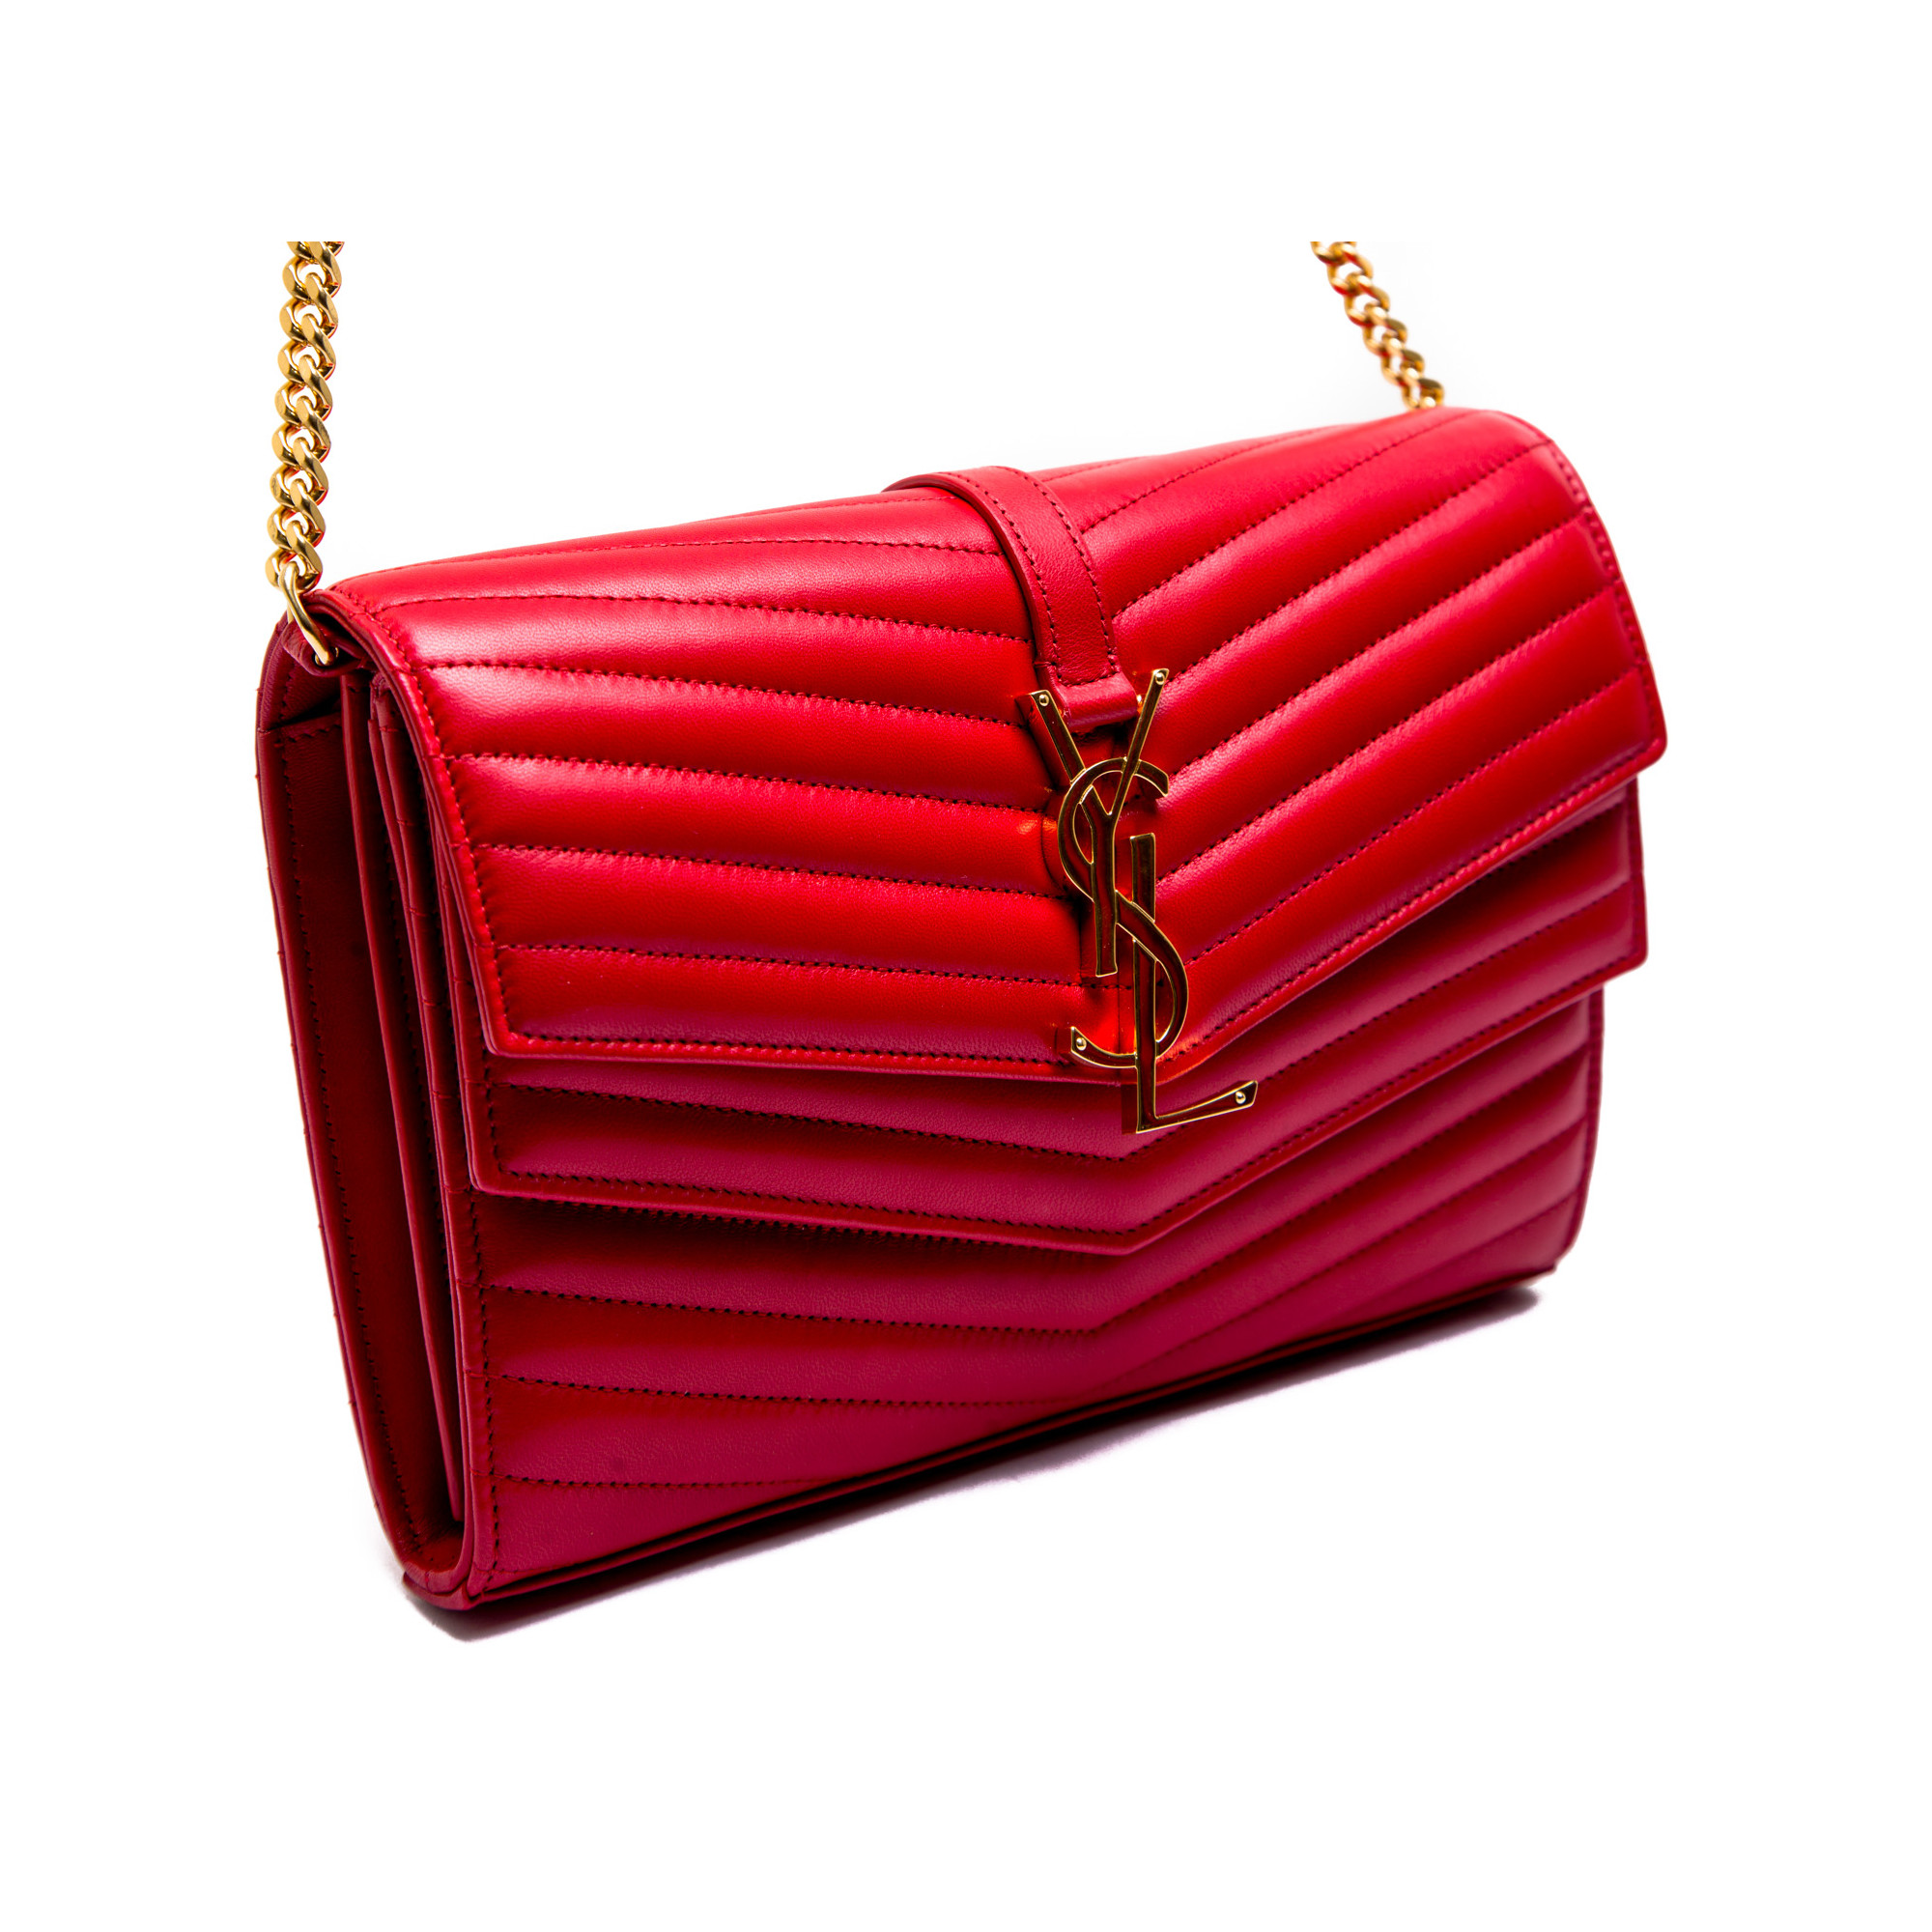 ... Saint Laurent ysl cw(295y)suportamat red Saint Laurent ysl cw(295y) c2dbd7f2c3b50